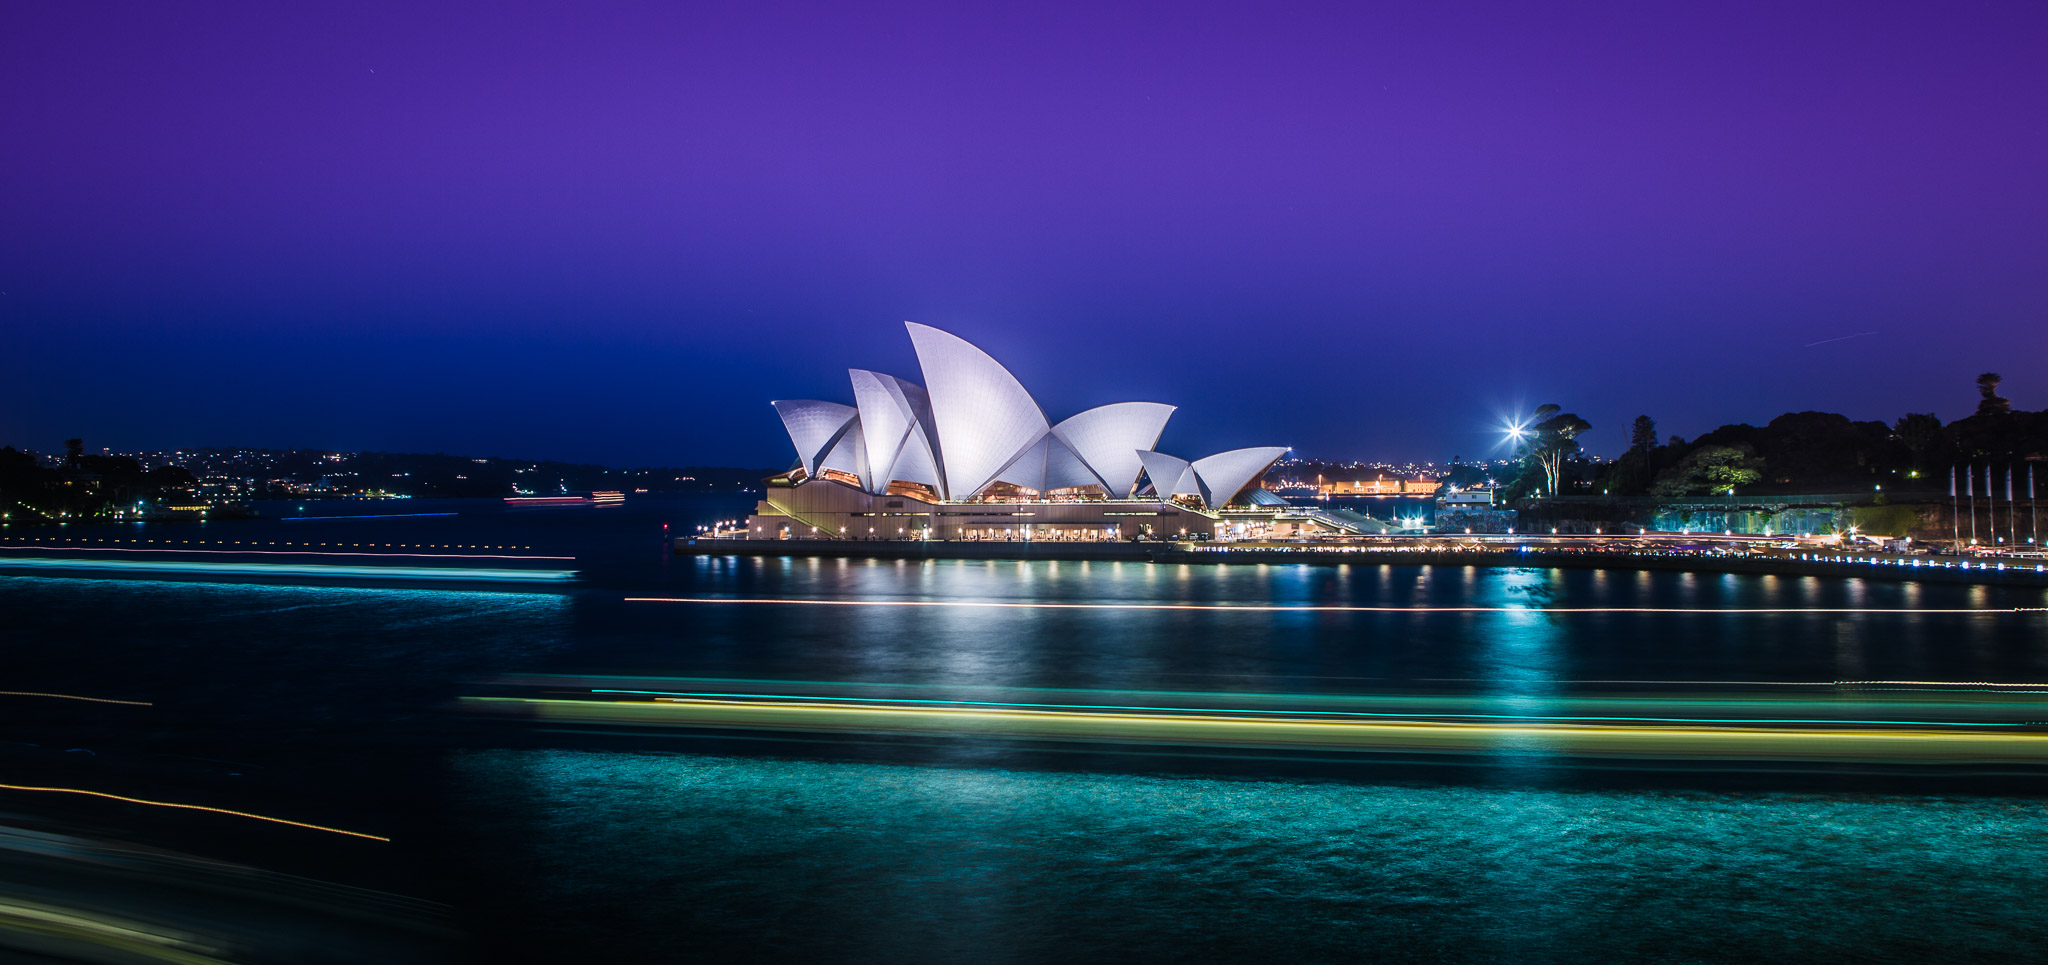 Sydney Photography Workshop - Day & Night